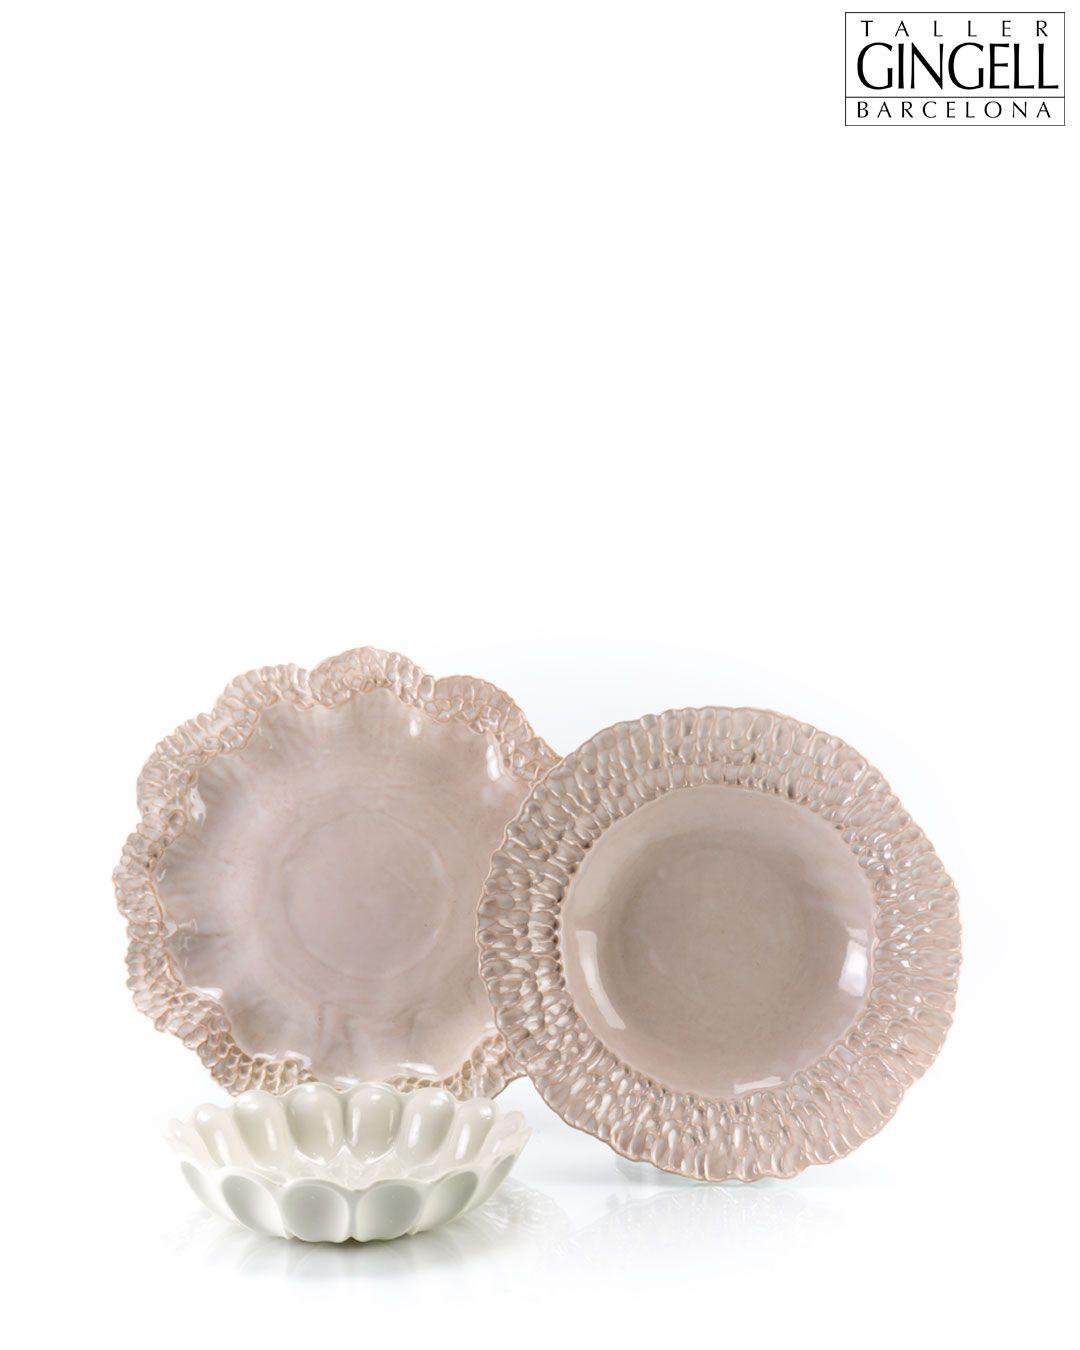 A handmade stoneware place setting. There's a subtle green glaze on the white wave bowl.  Un juego de vajilla de gres hecho a mano. Hay un sutil esmalte verde en el bowl blanco.  #ceramics #handmade #functionalceramics #instapottery #contemporaryceramics #design #shopsmall #style #handcrafted #barcelona #interiordesign #homedecor #makersgonnamake #designer #craft #giftideas #artisan #inspiration #pottery #tableware #homeware #stoneware #keramik